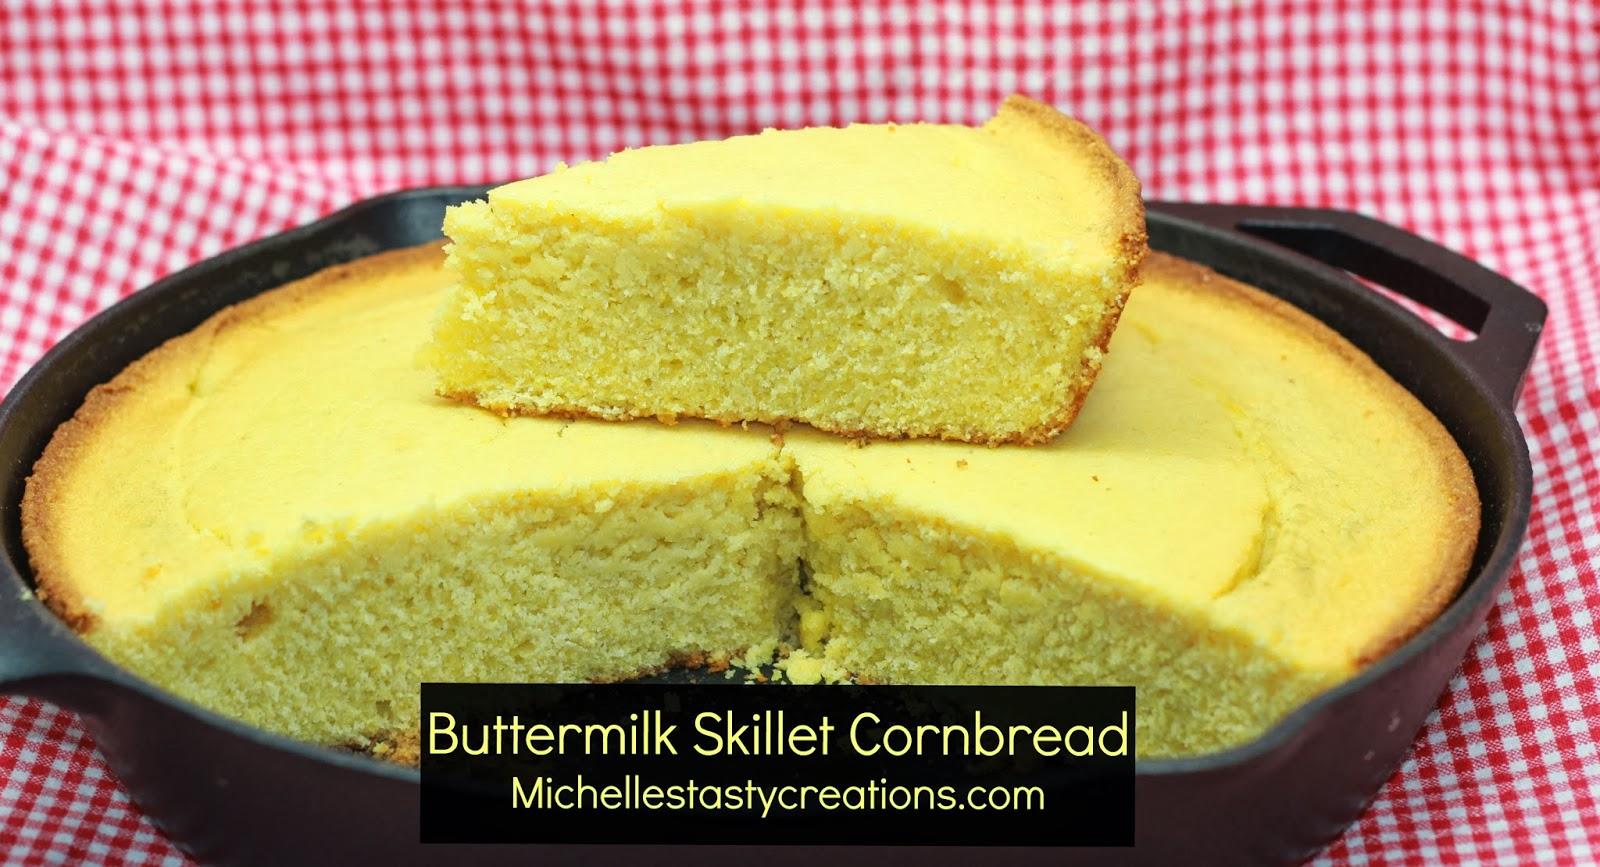 Michelle's Tasty Creations: Buttermilk Skillet Cornbread